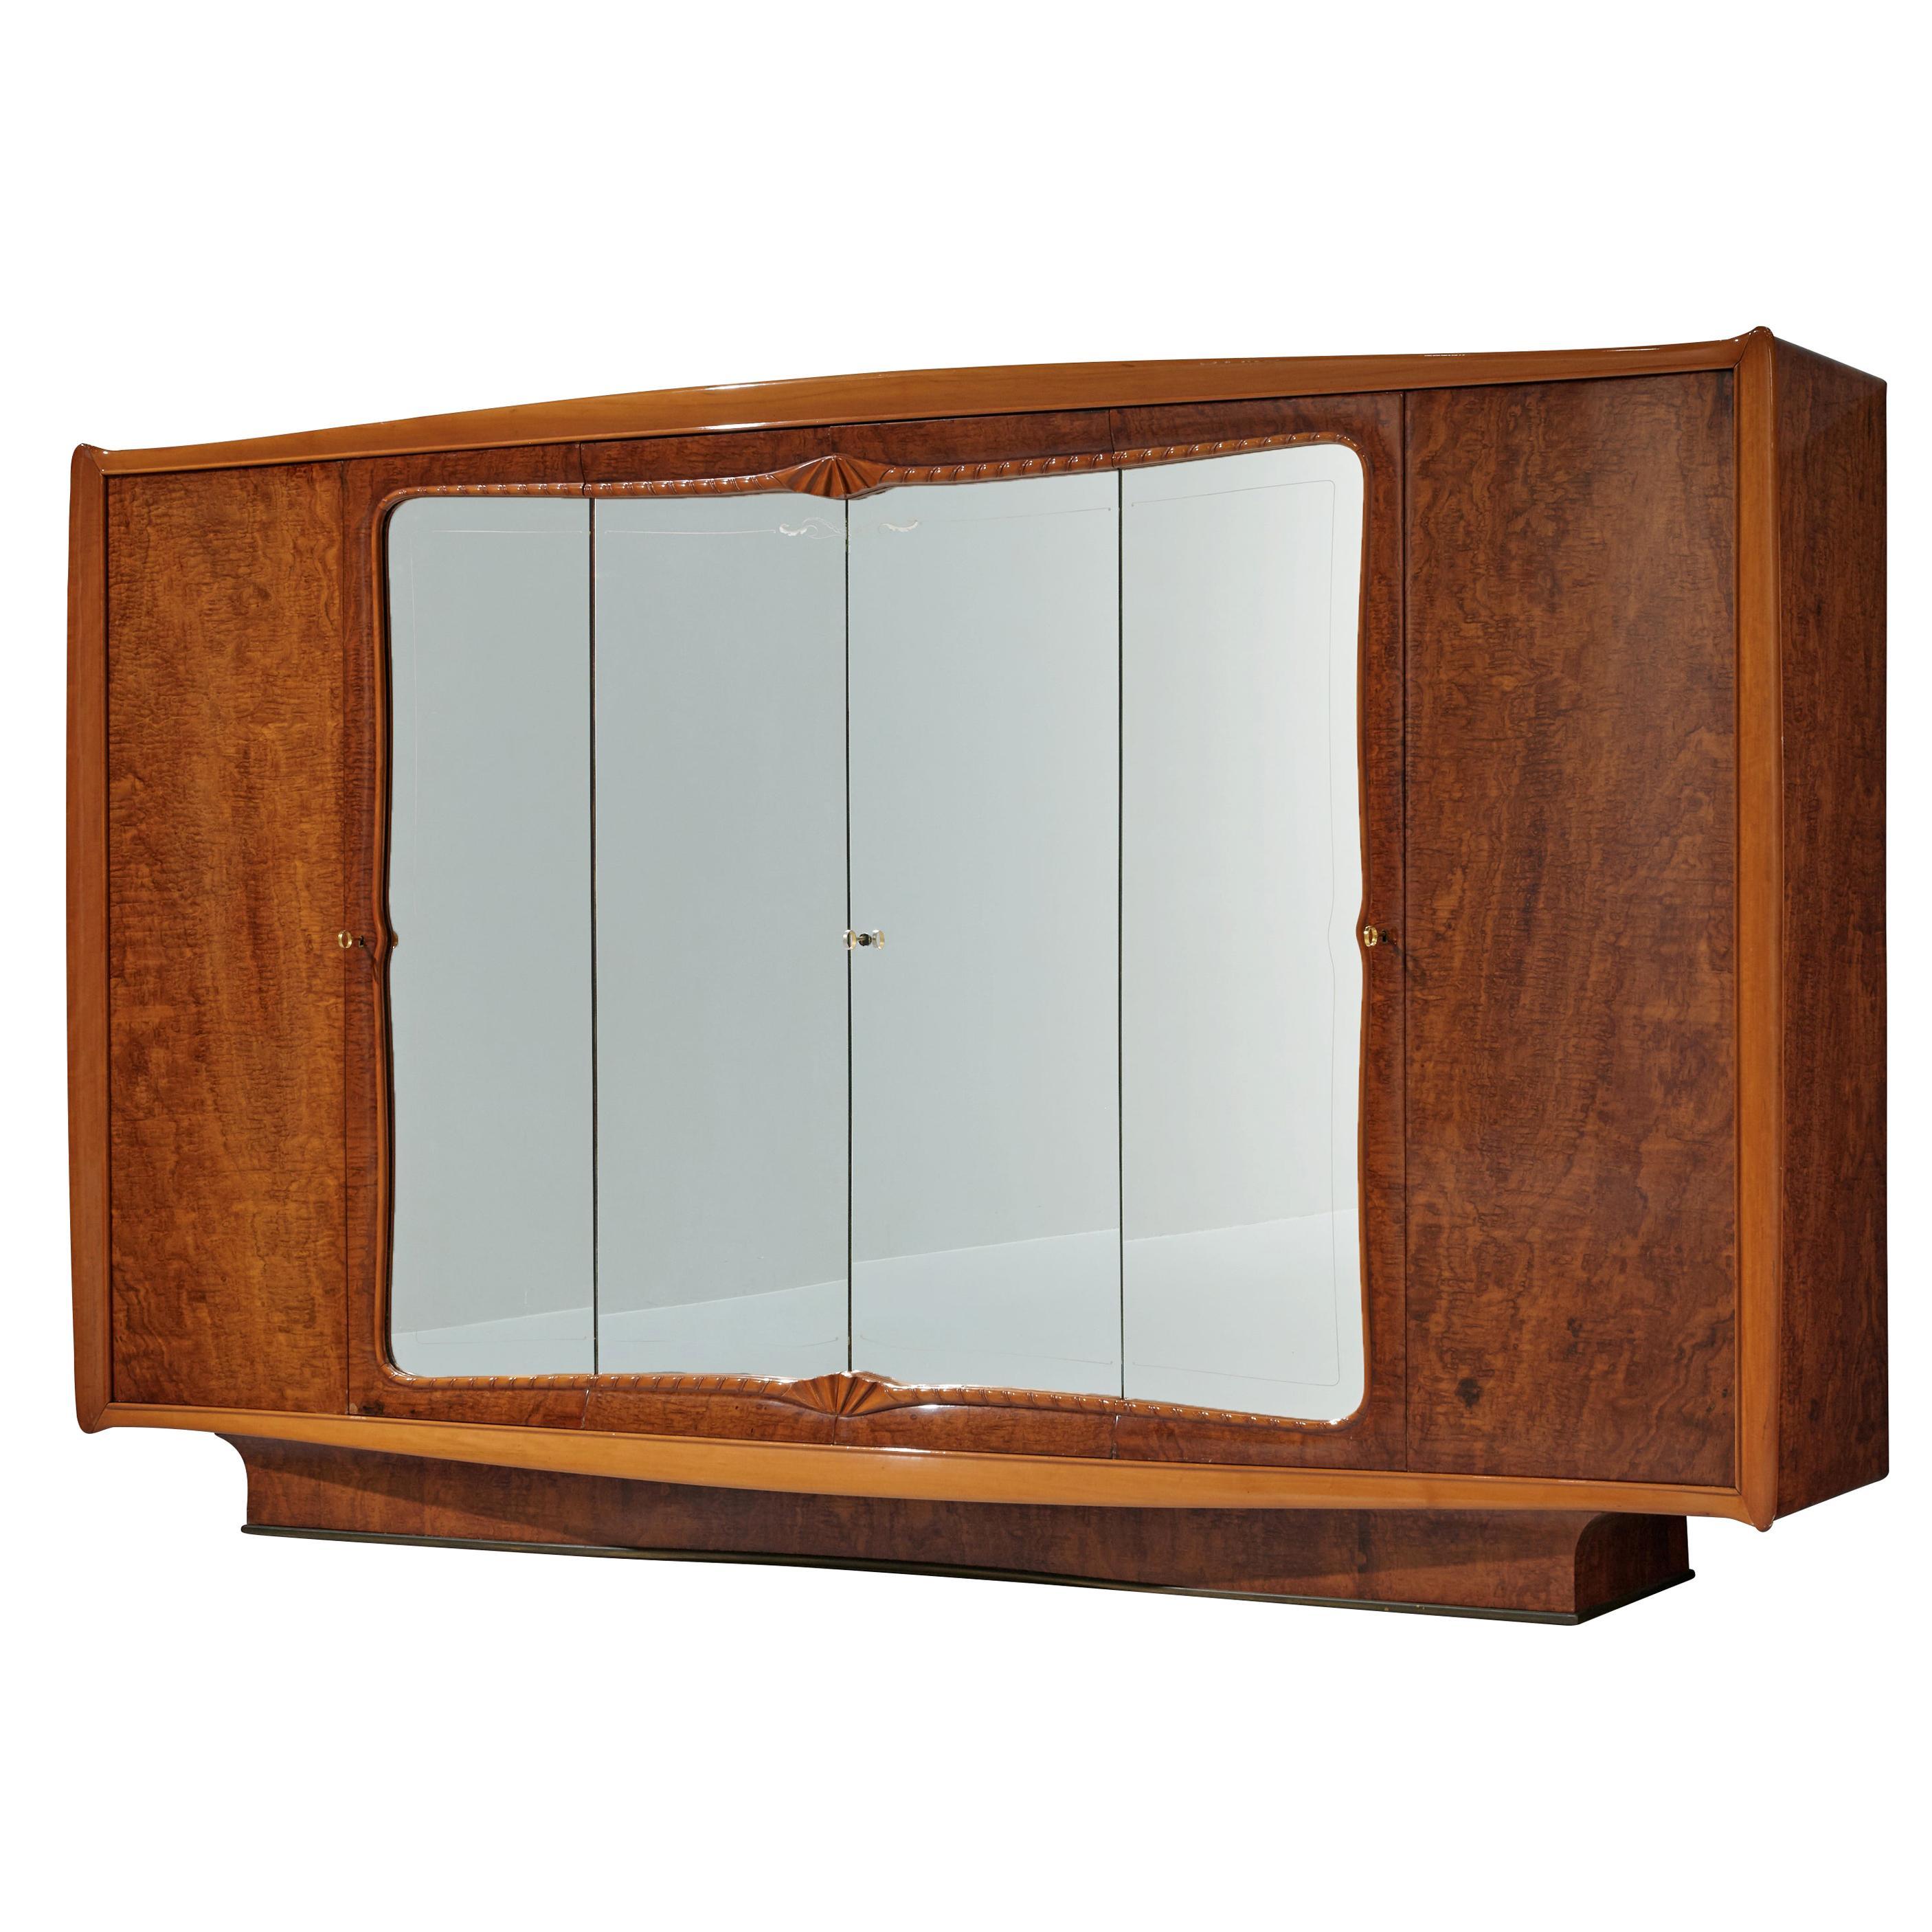 Large Italian Wardrobe with Mirrored Doors